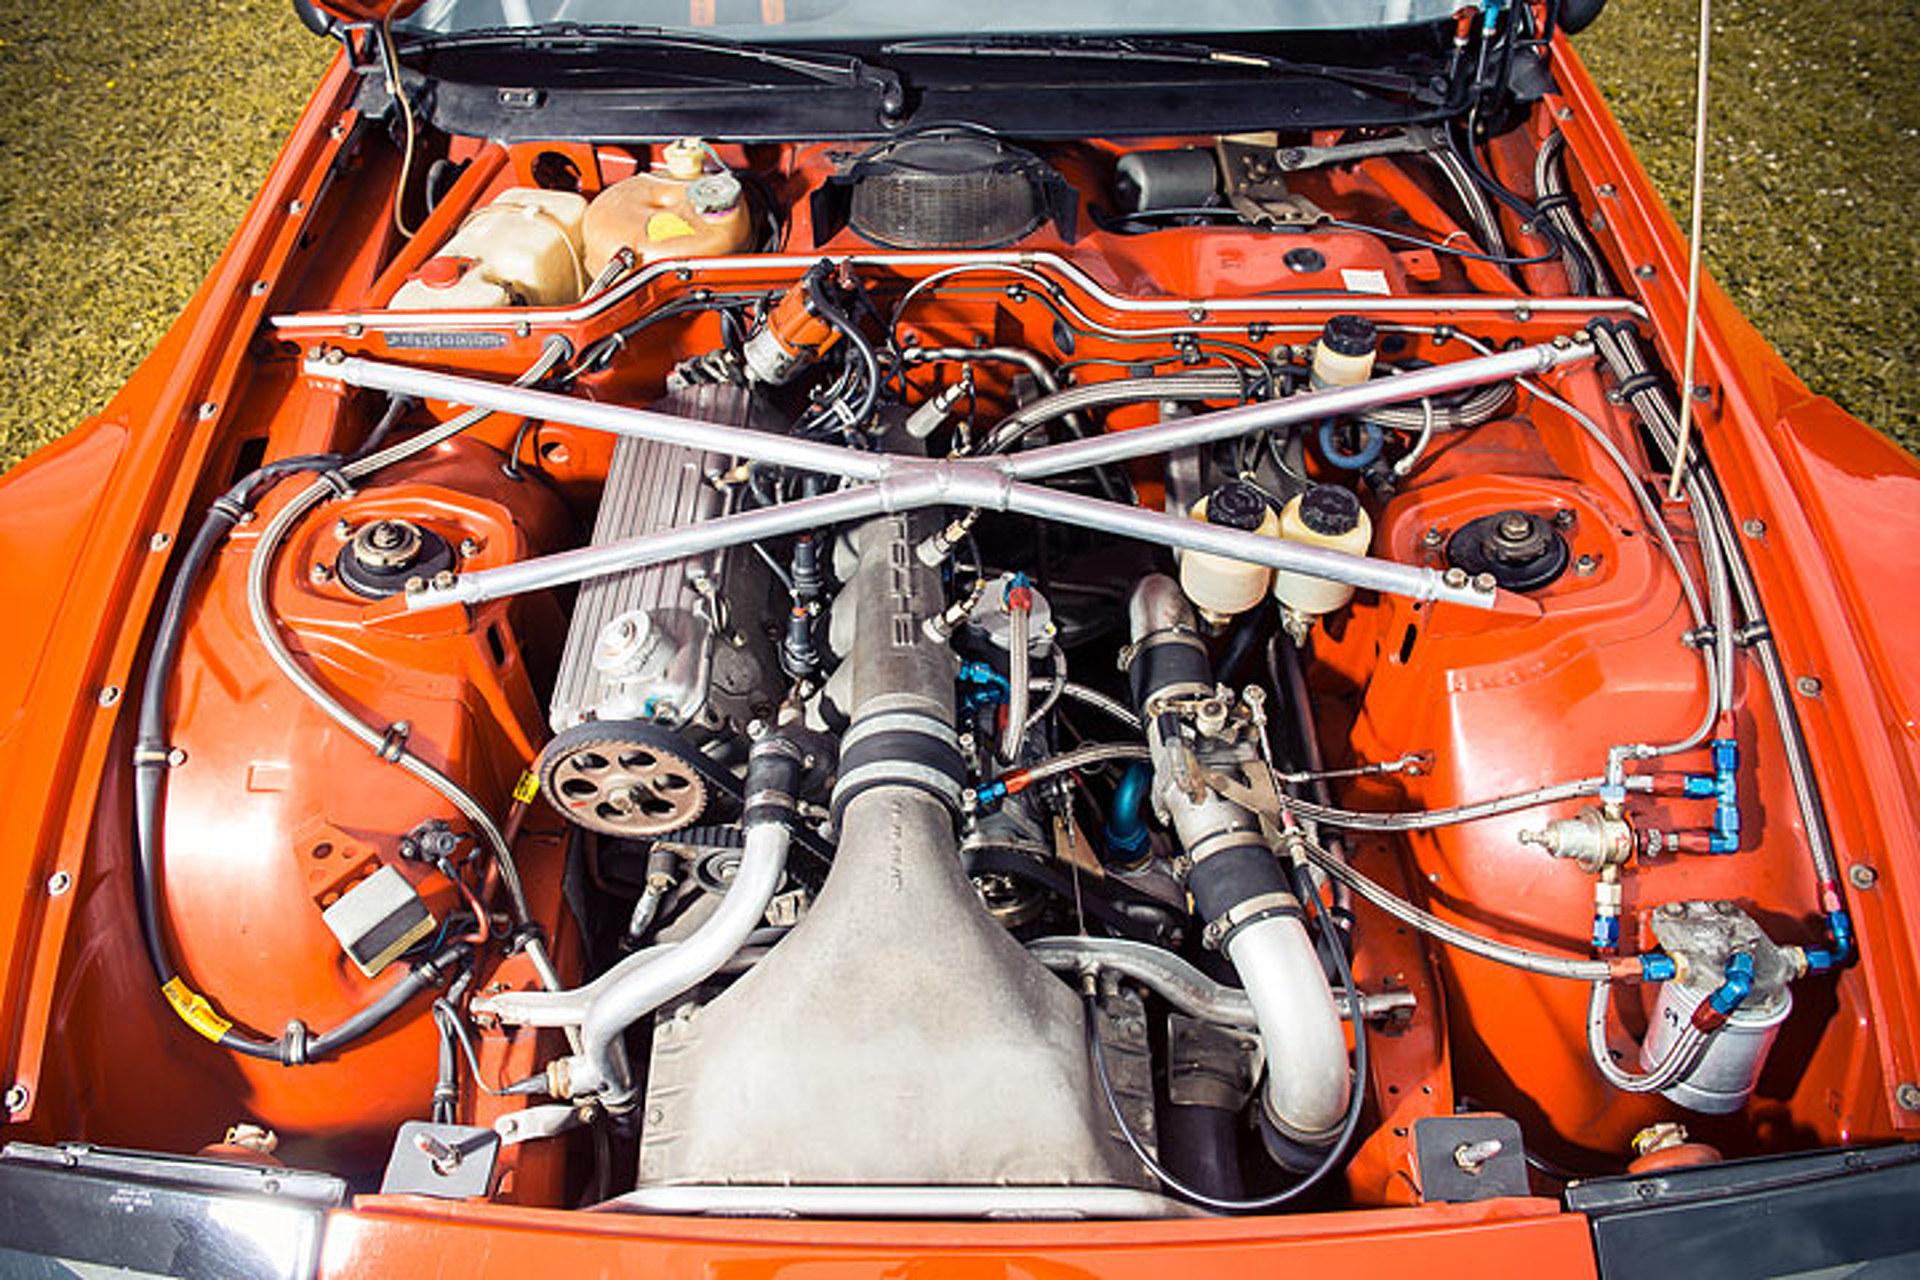 A Never-Raced, 1-of-17 Porsche GTR Comes out of Hiding